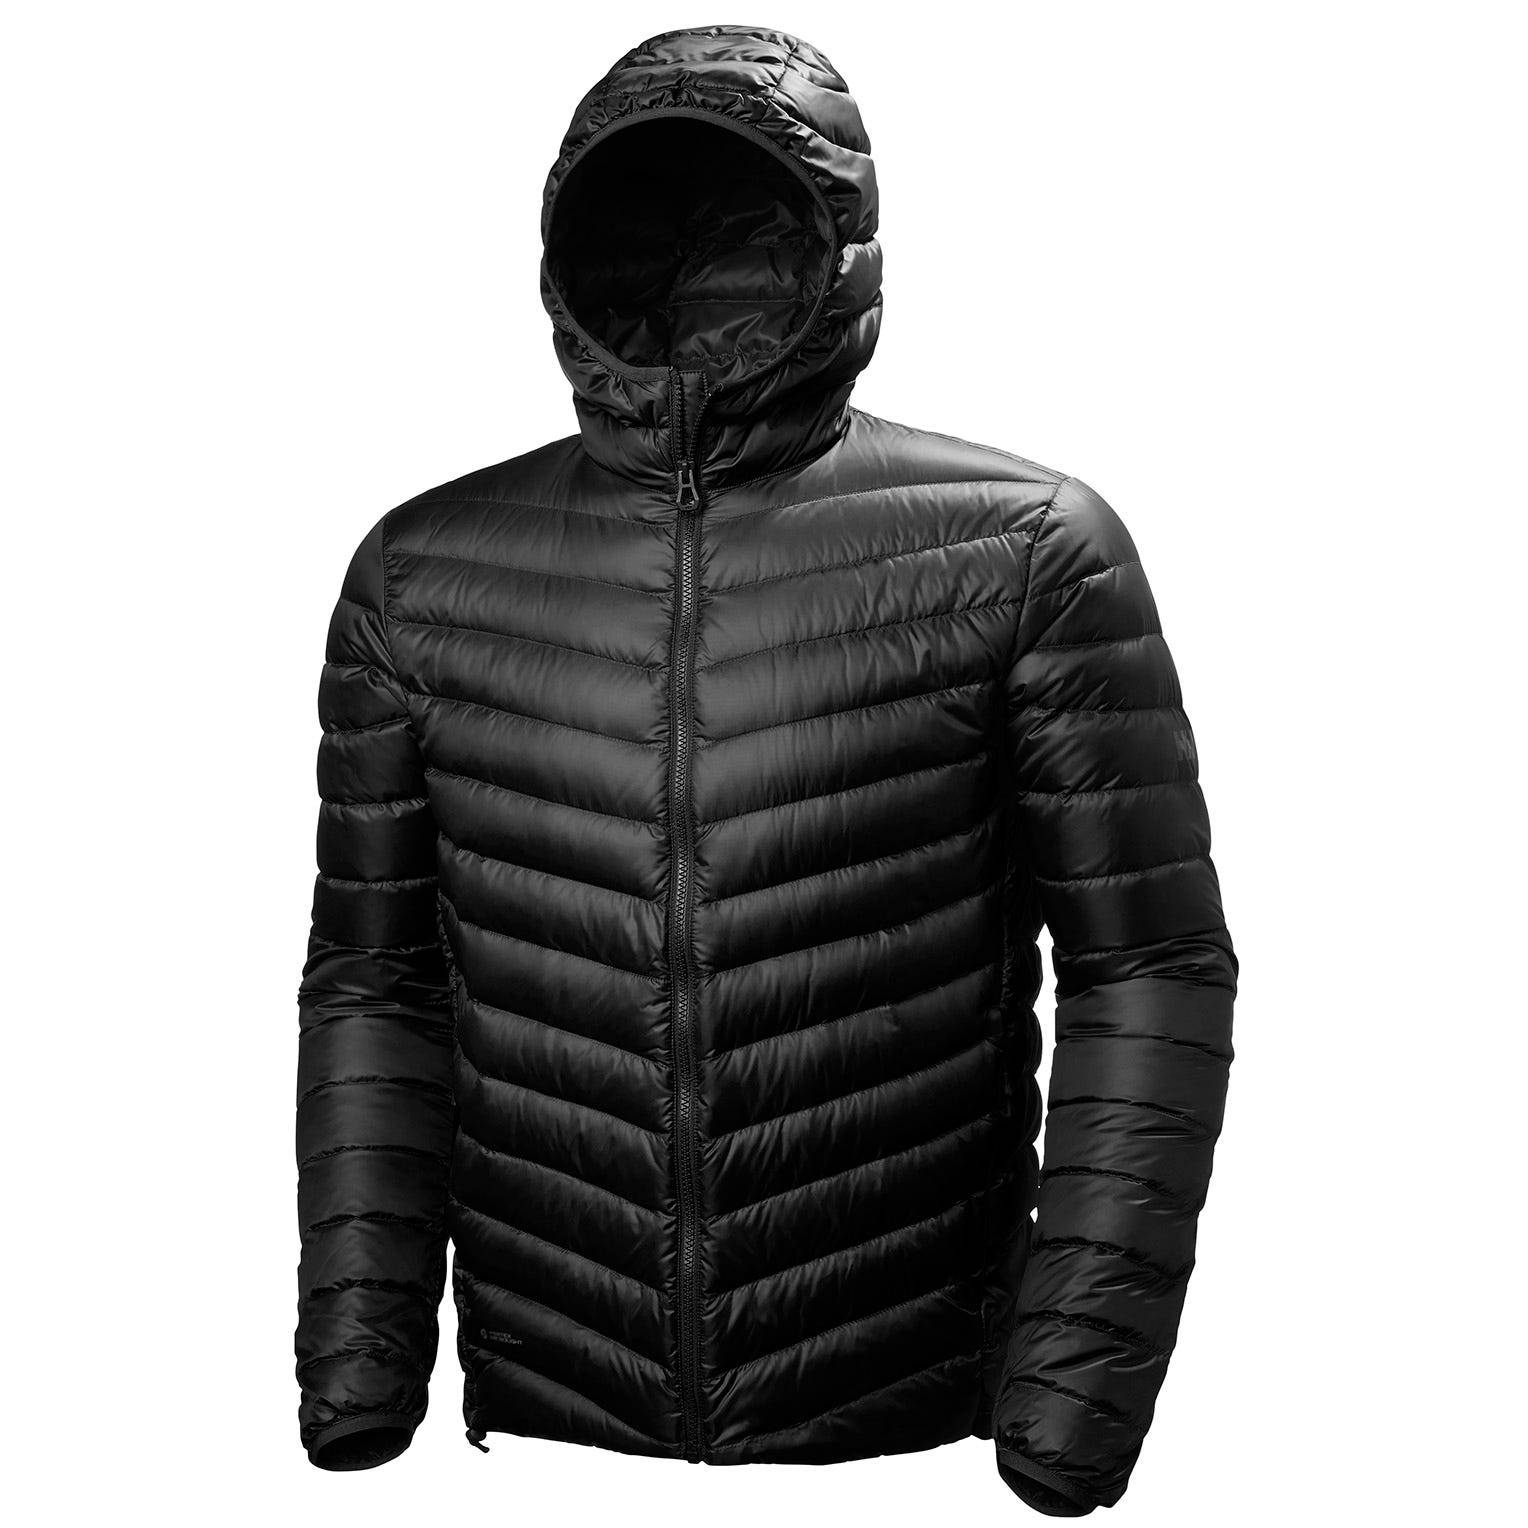 Helly Hansen Verglas Hooded Down Insulator Mens Hiking Jacket Black XL